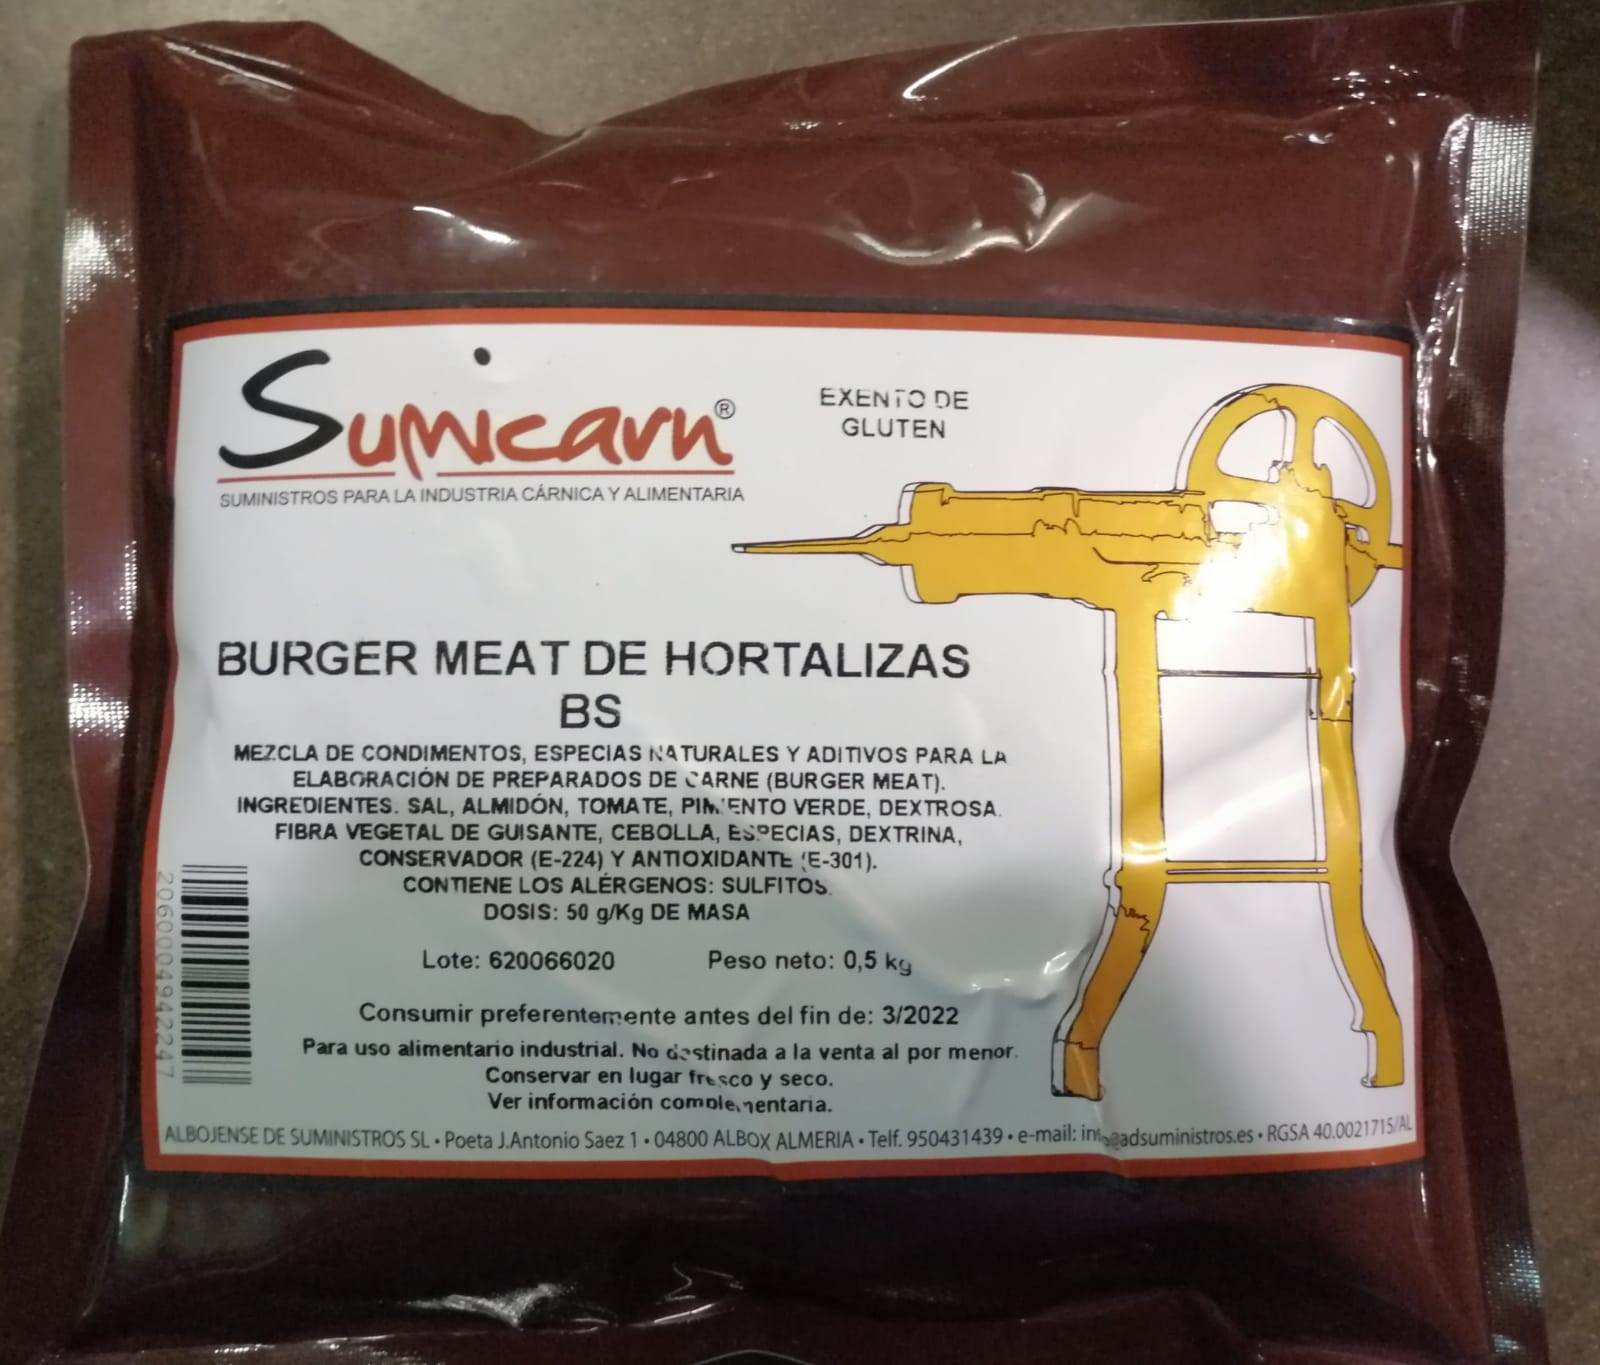 Burger meat exclusivos sumicarn Img-2104